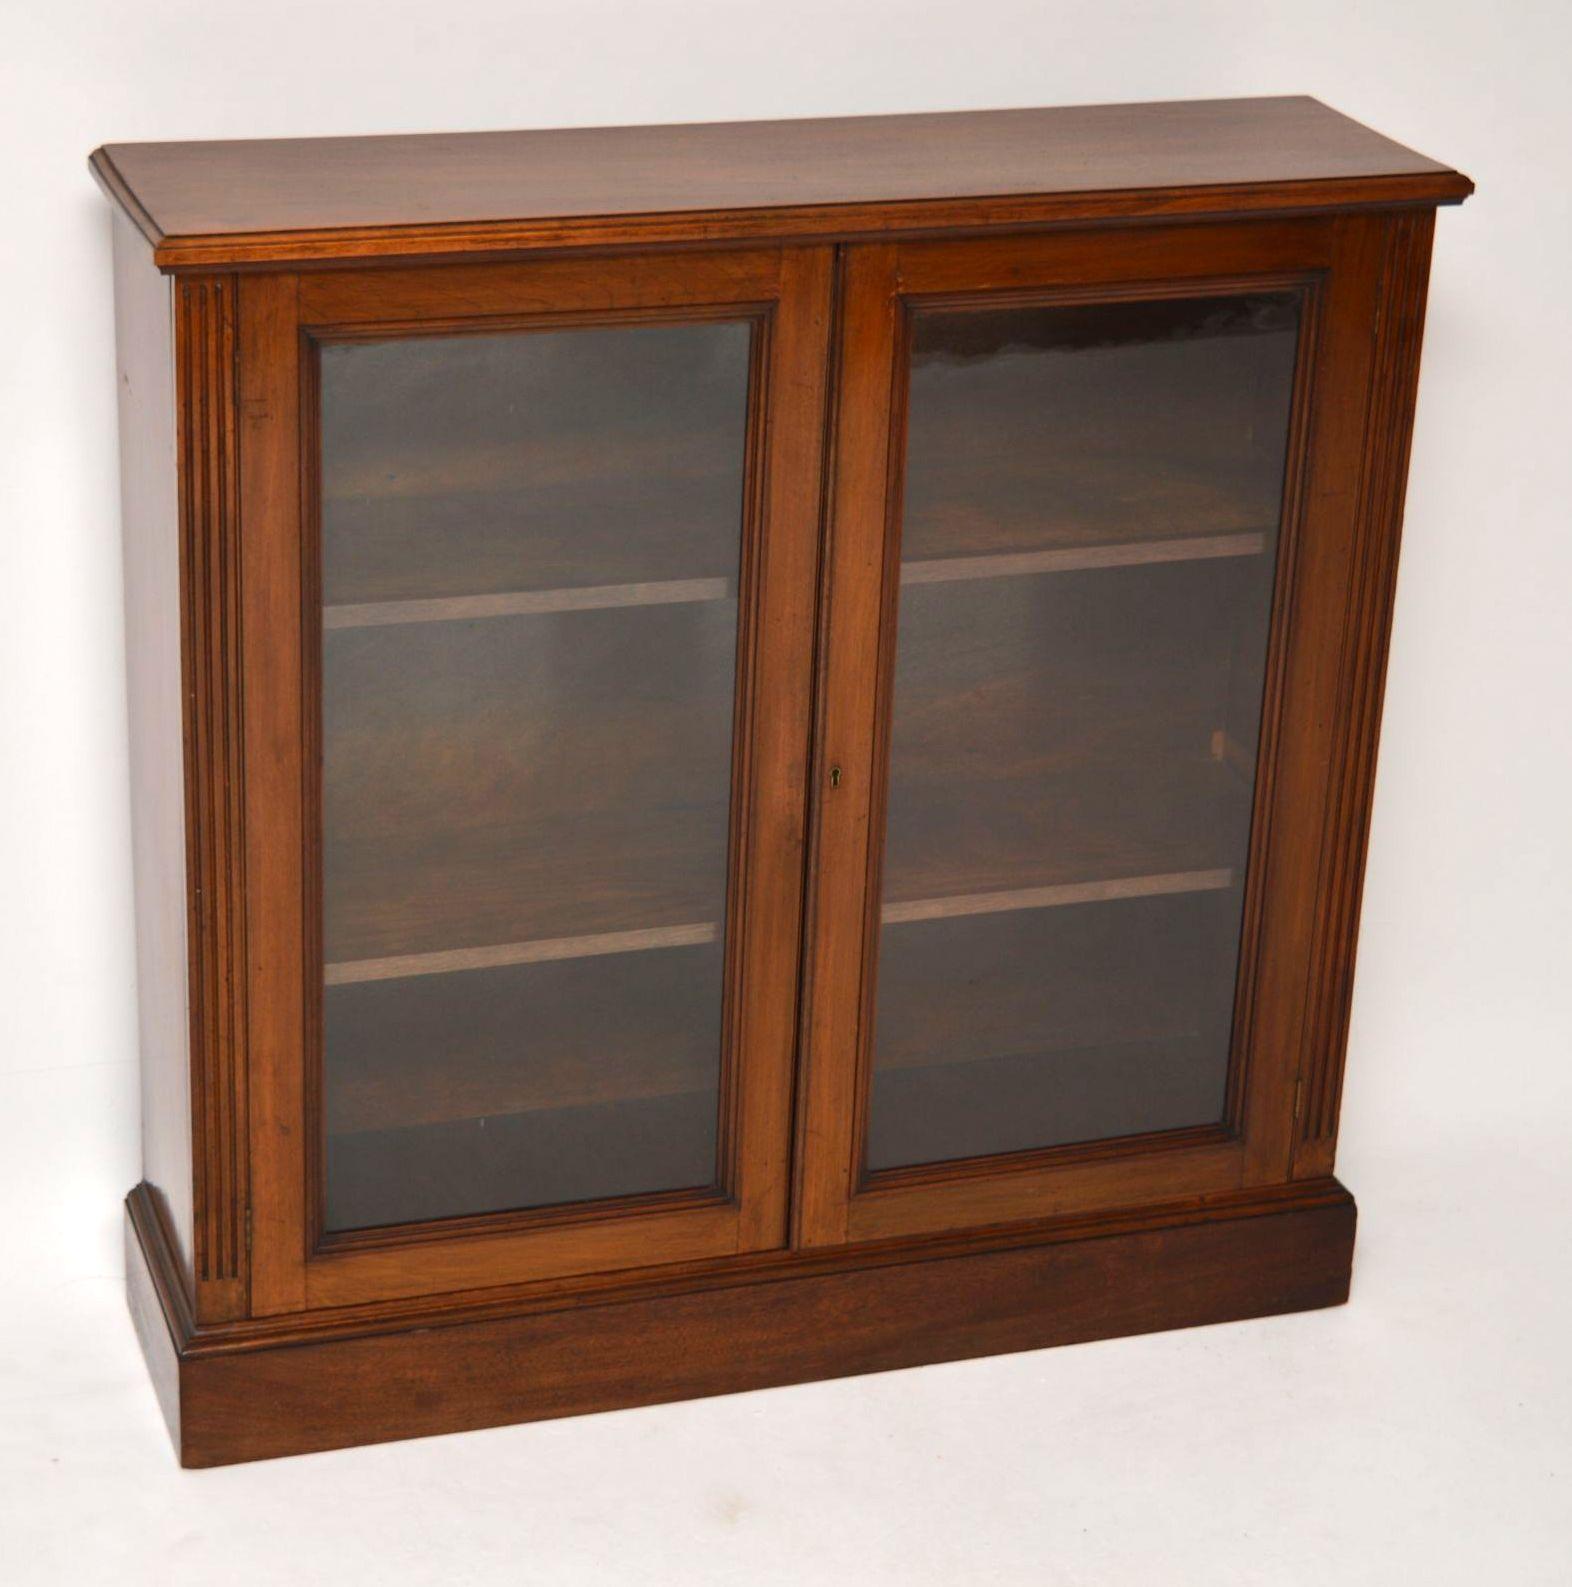 antikes victorian mahagoni b cherregal mit t ren. Black Bedroom Furniture Sets. Home Design Ideas